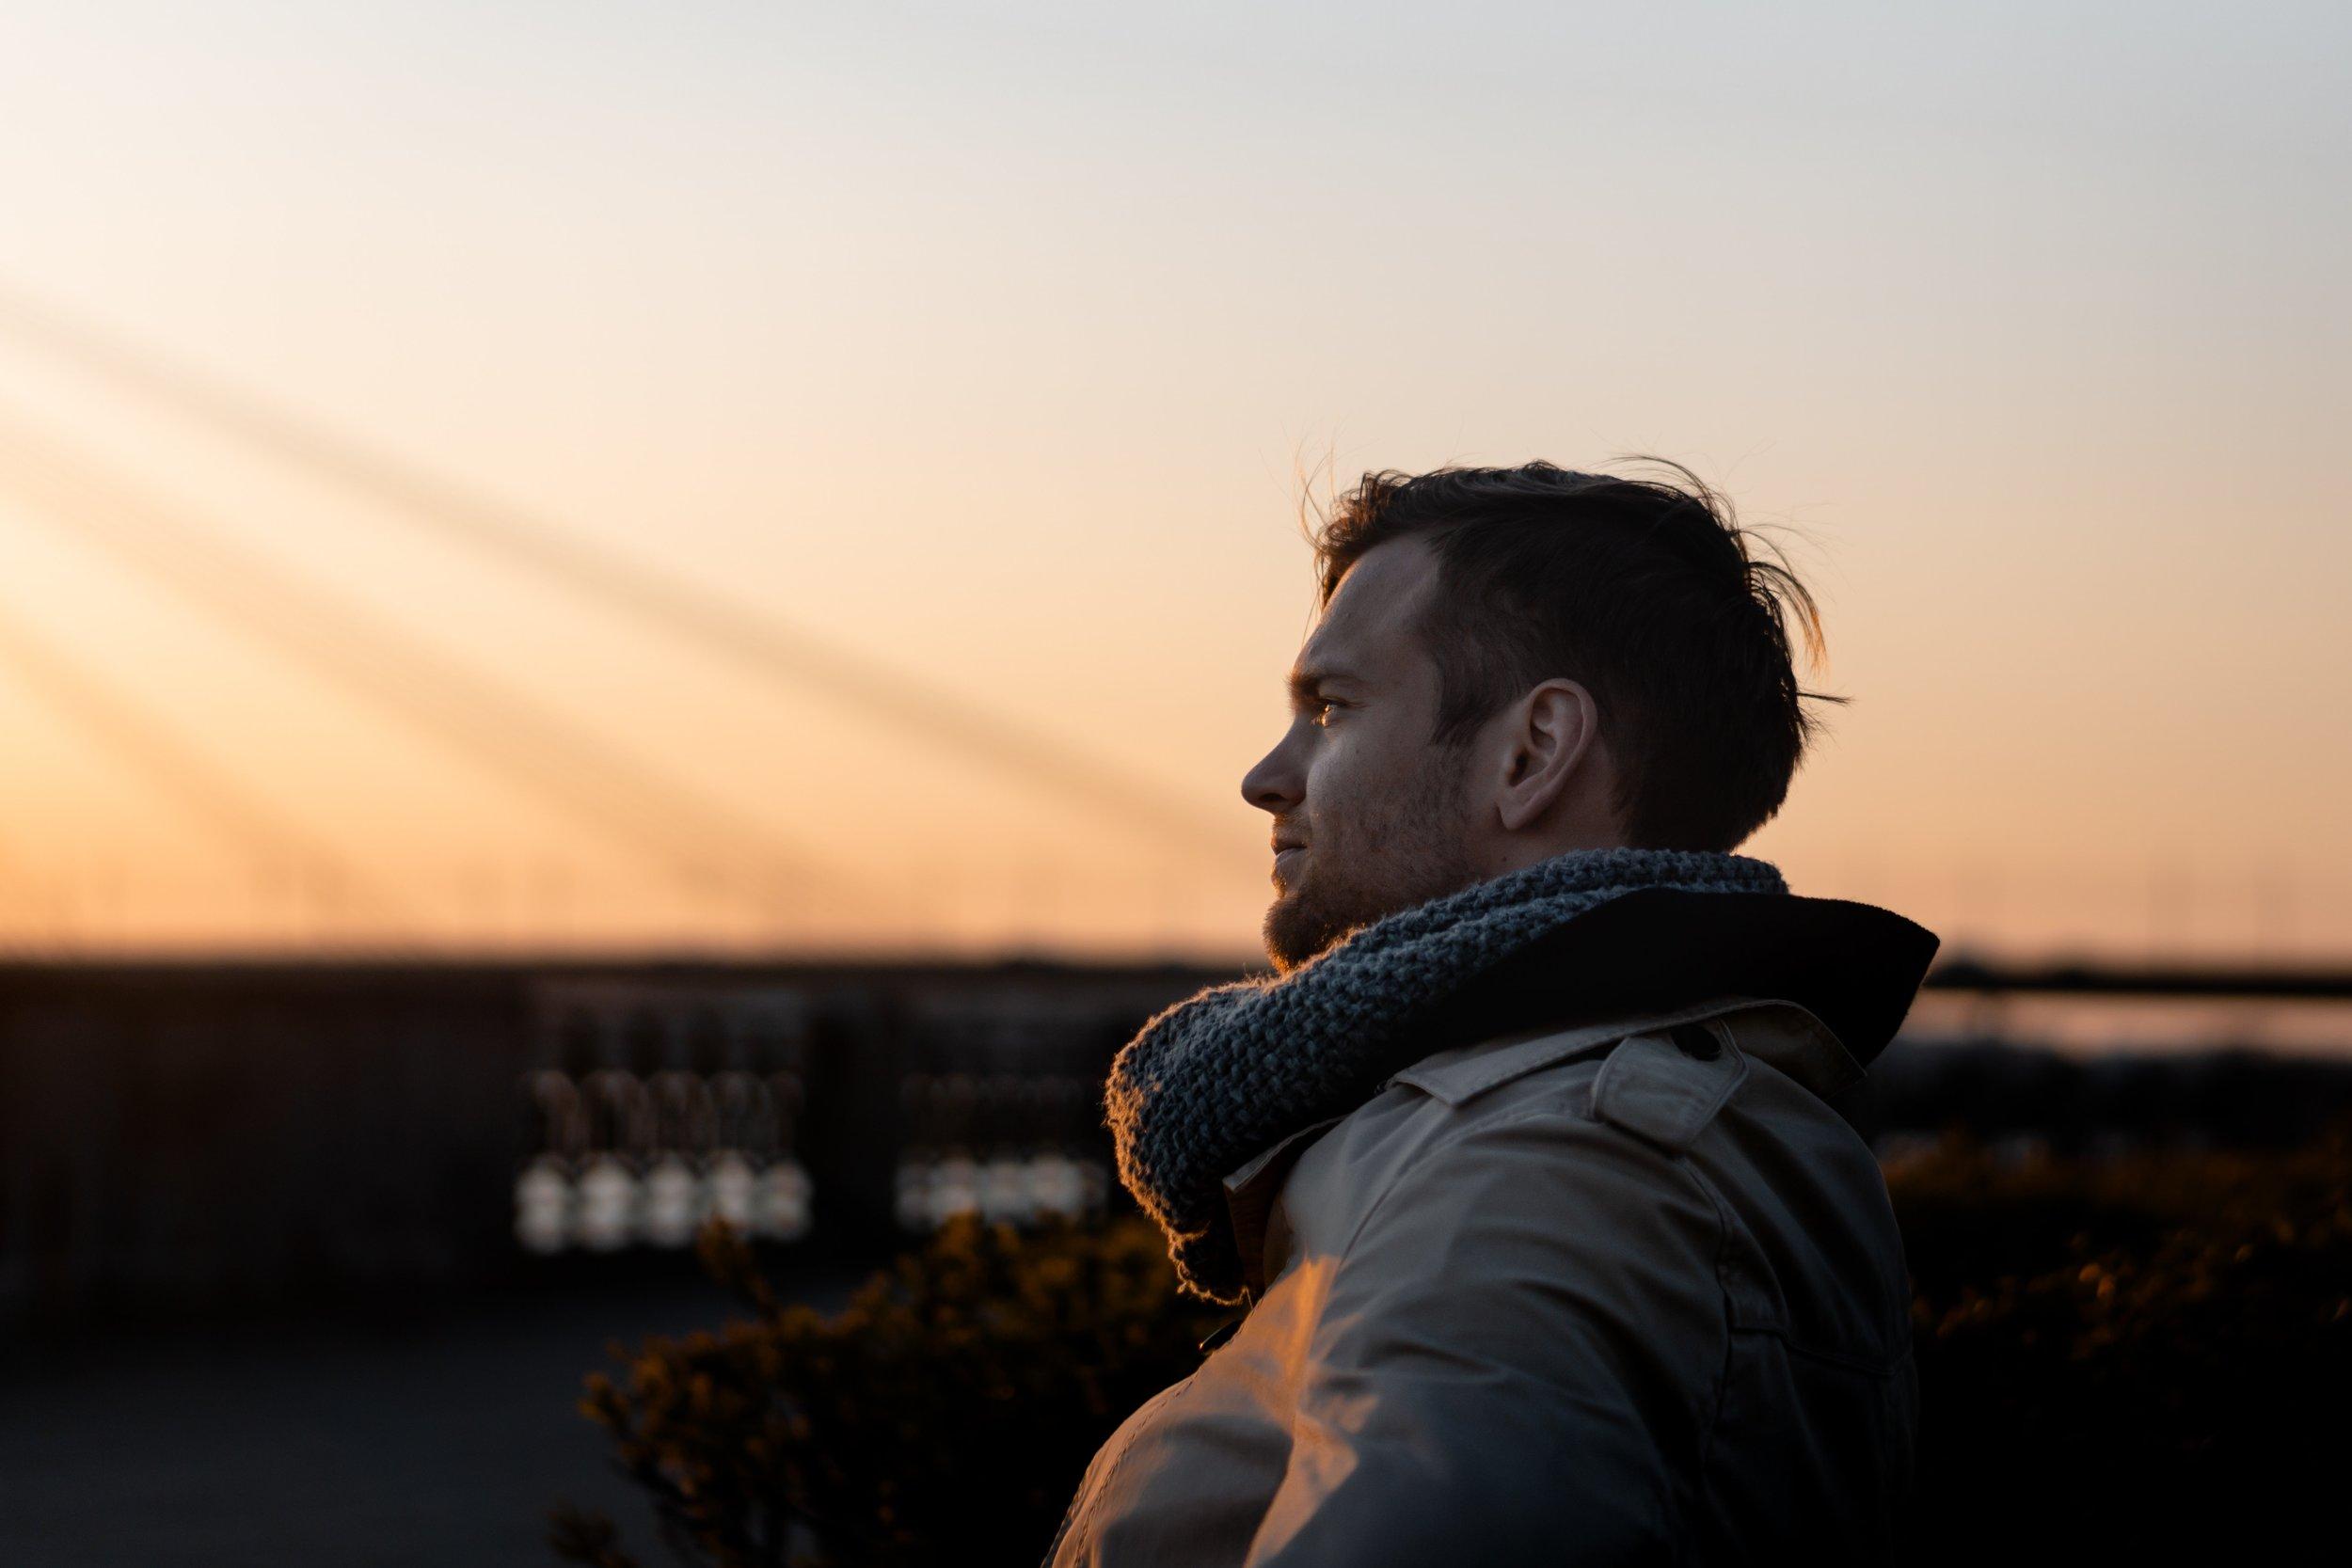 Image credit: https://www.pexels.com/photo/man-wearing-gray-coat-during-golden-hour-2214419/